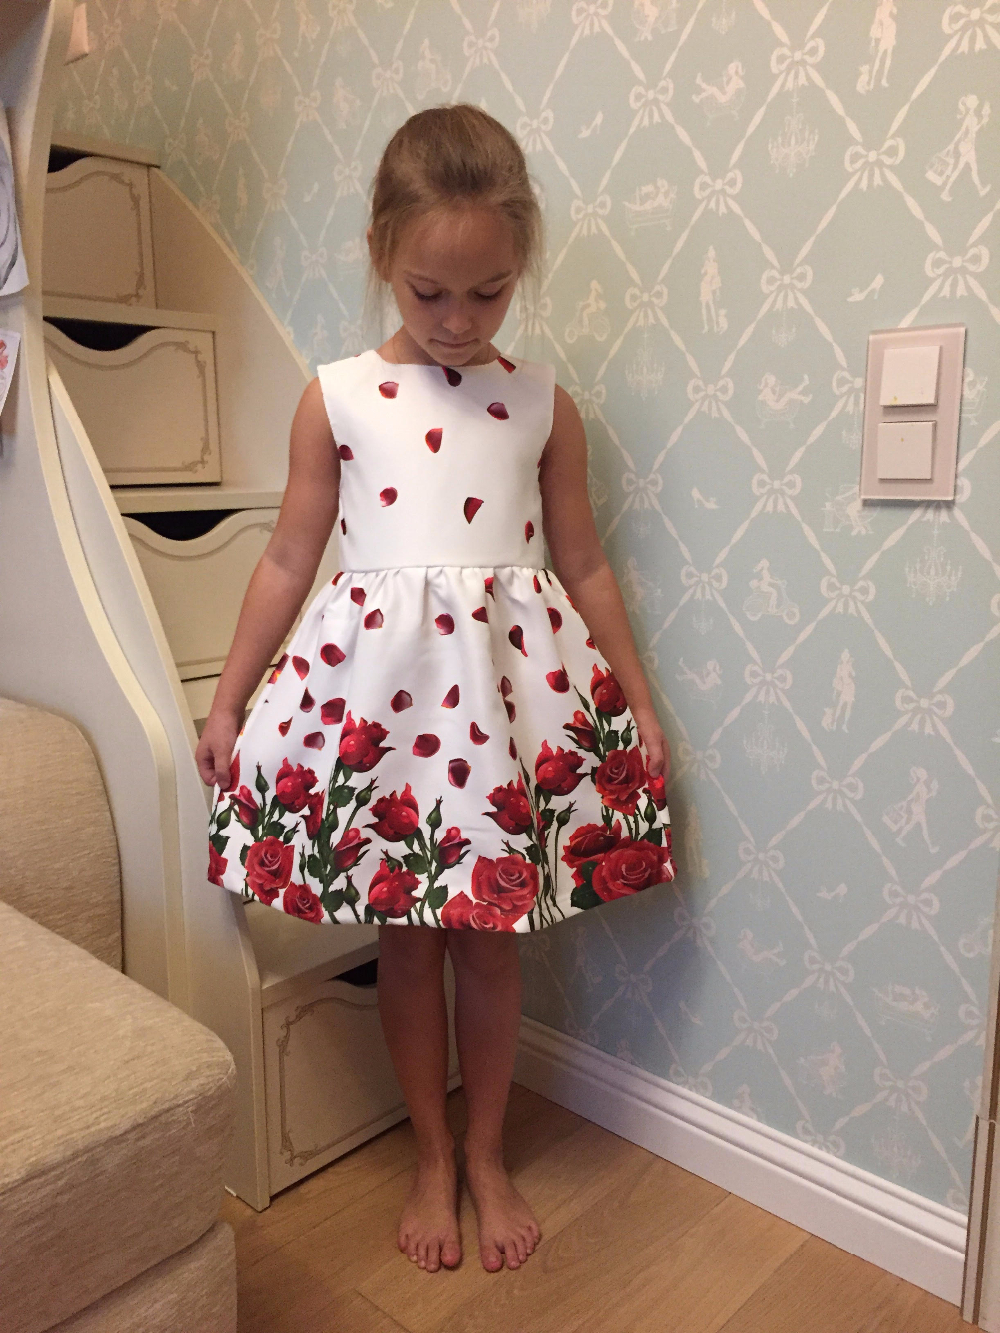 Bear Leader Girls Dress Children Clothing 2016 Brand Princess Dress Girl Clothes Sleeveless Floral Kids Dress for Girls Costumes